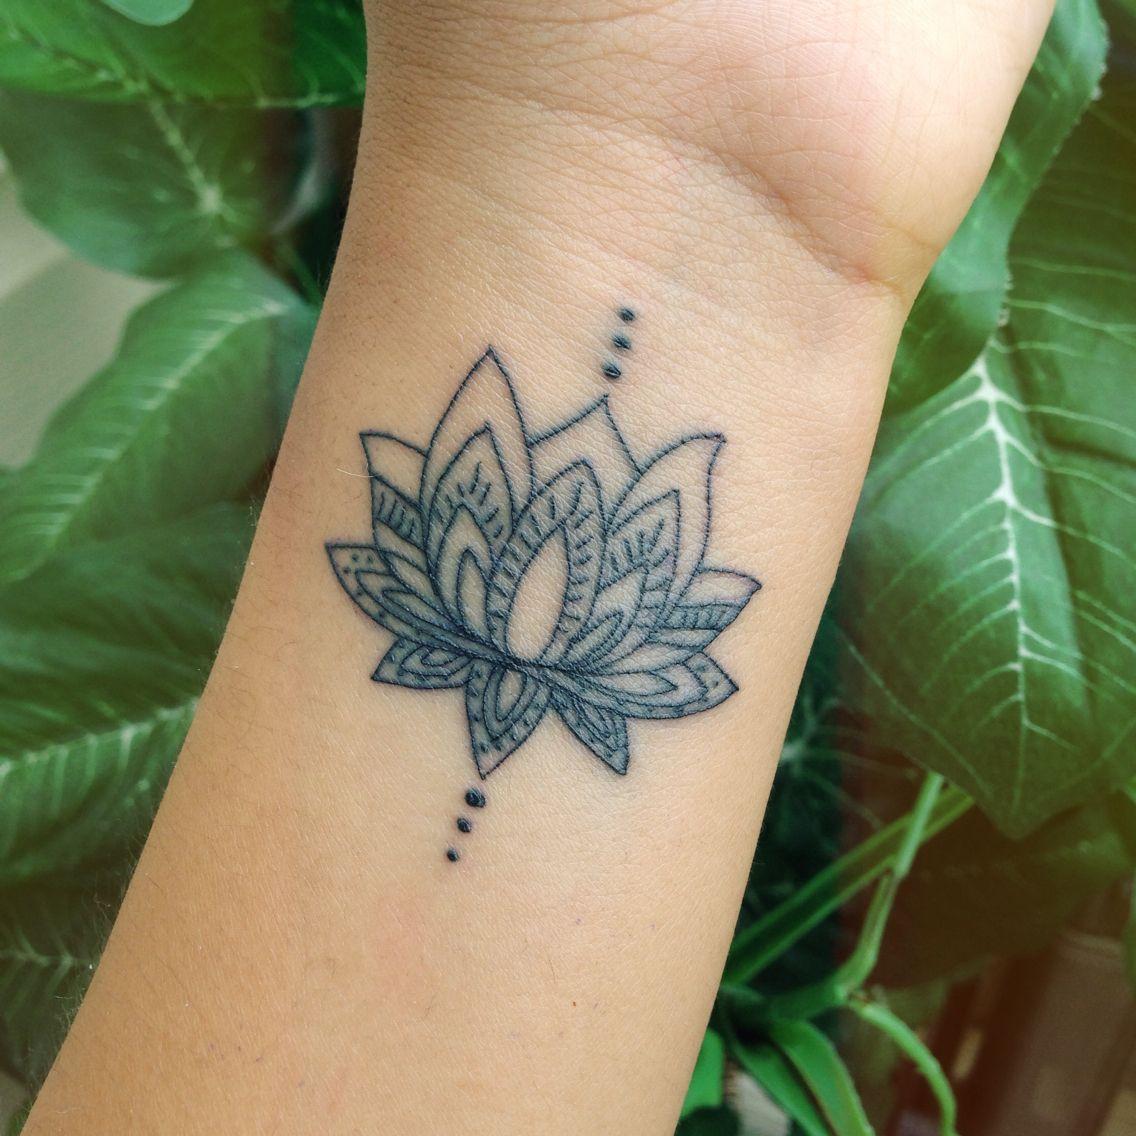 Lotus Flower — symbolizes strength, positivity & new